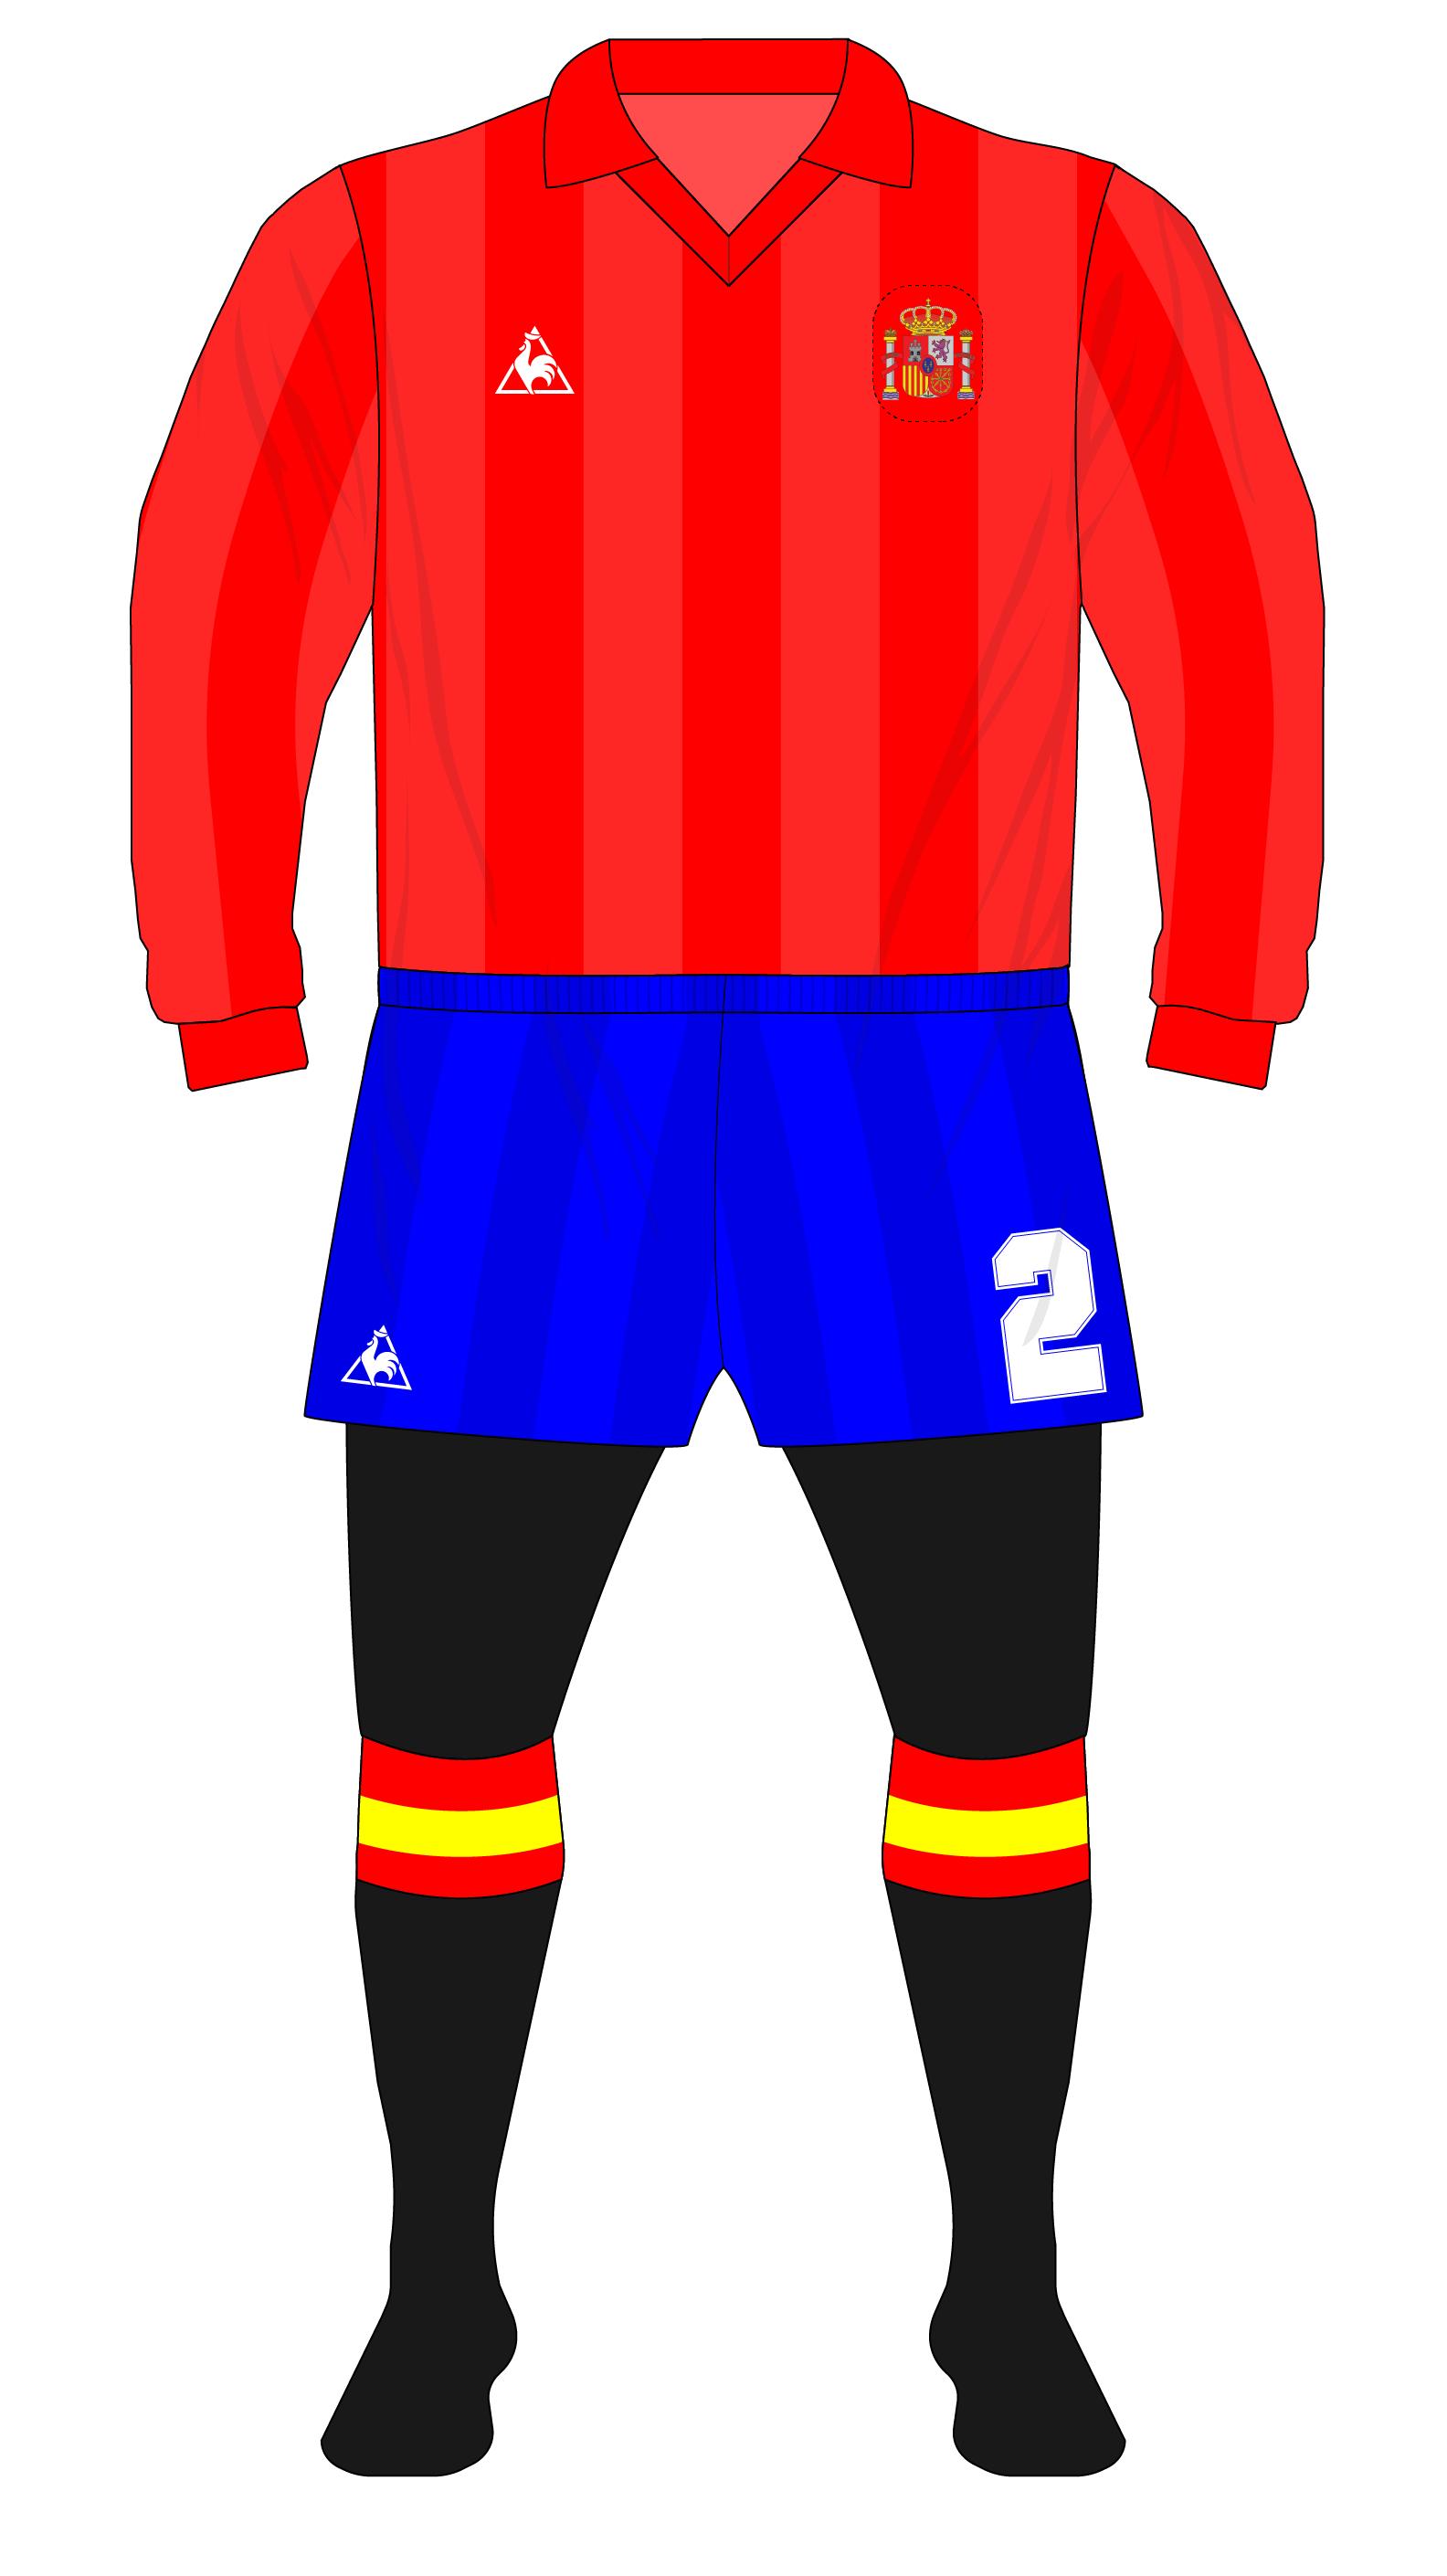 le coq sportif 1984 jacket